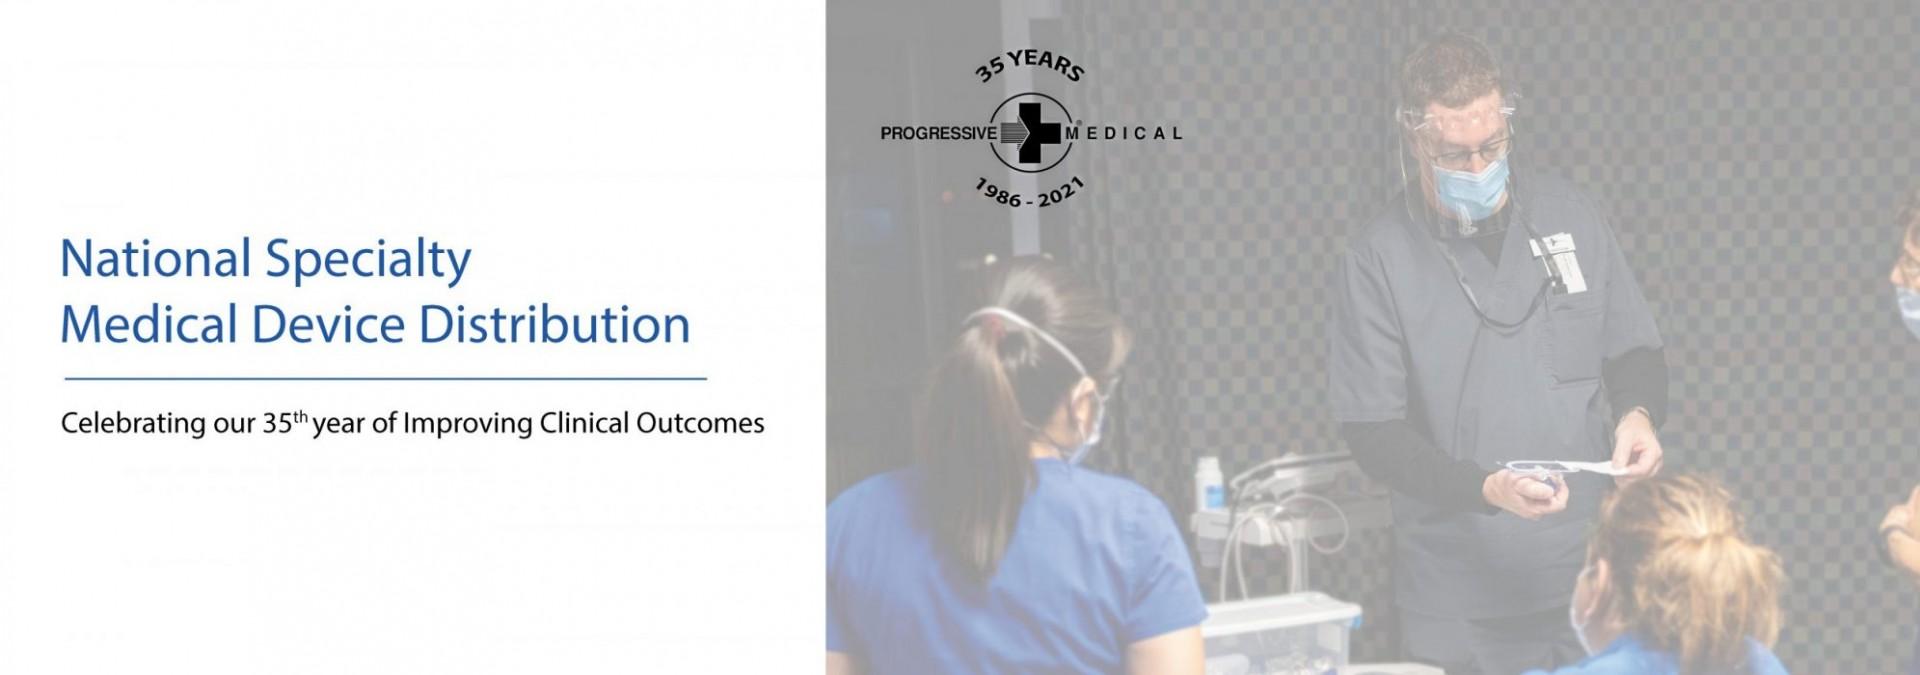 Progressive Medical Inc 35th Anniversary Sliding Image